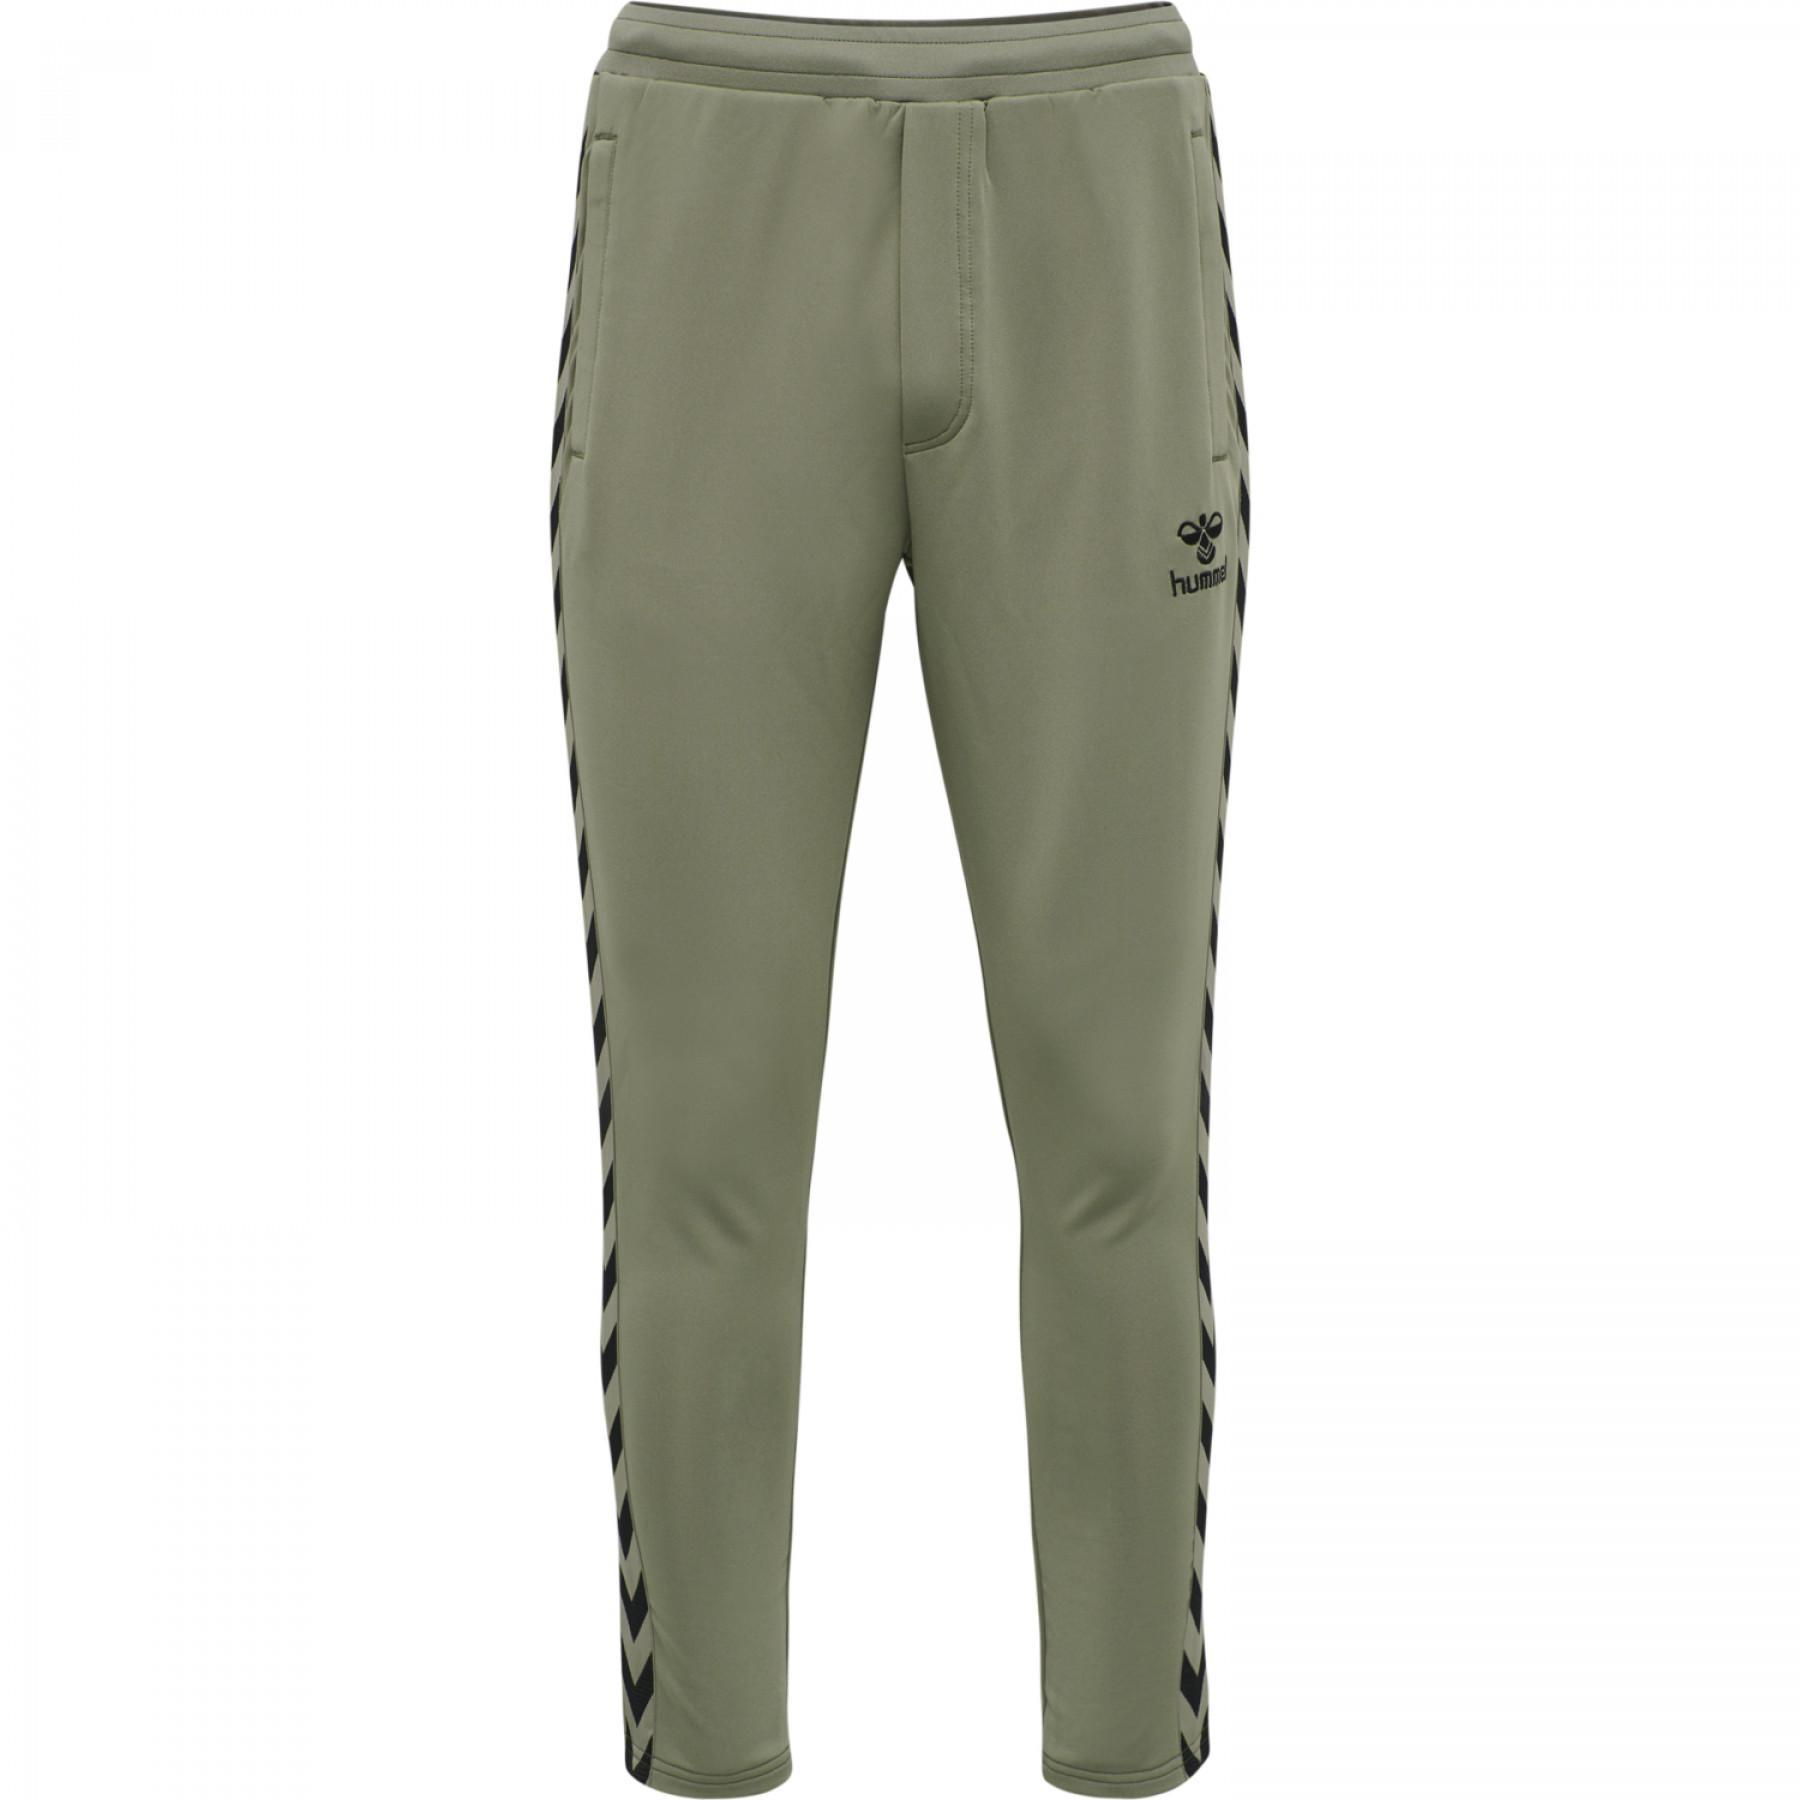 Hummel HmlNATHAN Pants 2.0 tapered